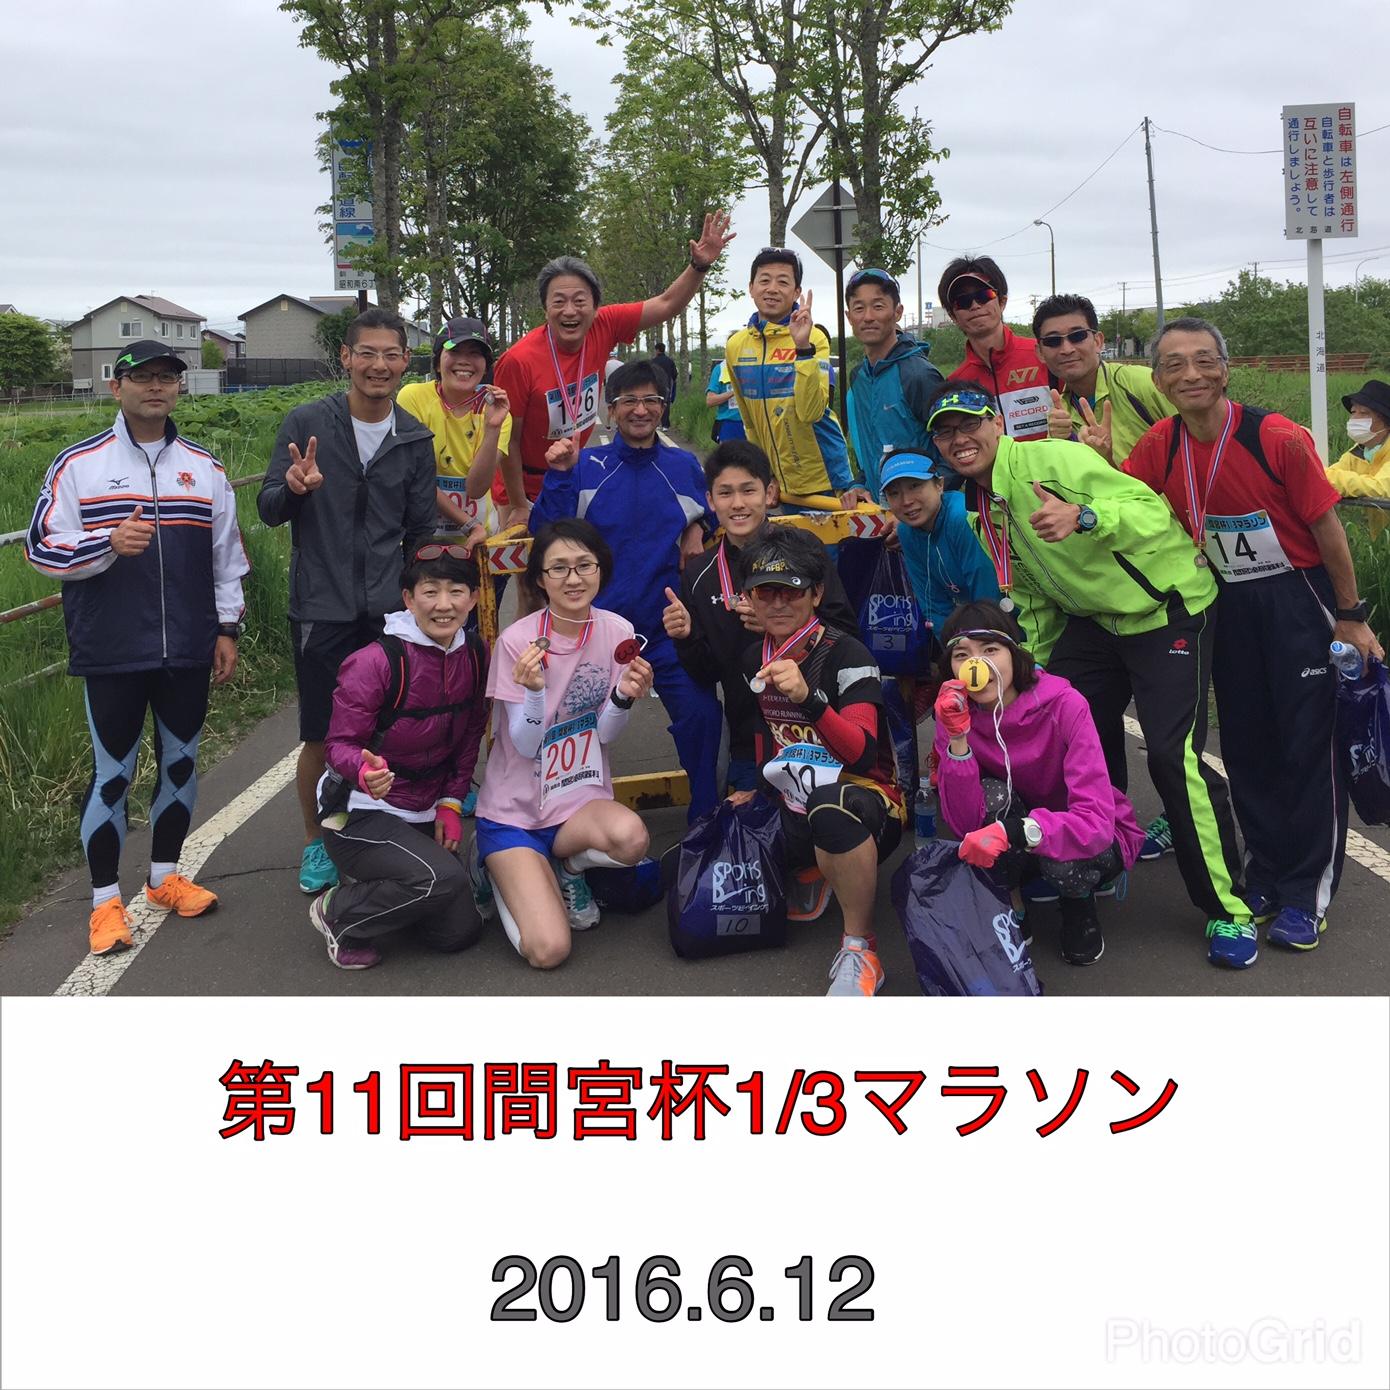 image9_20160621225217420.jpg